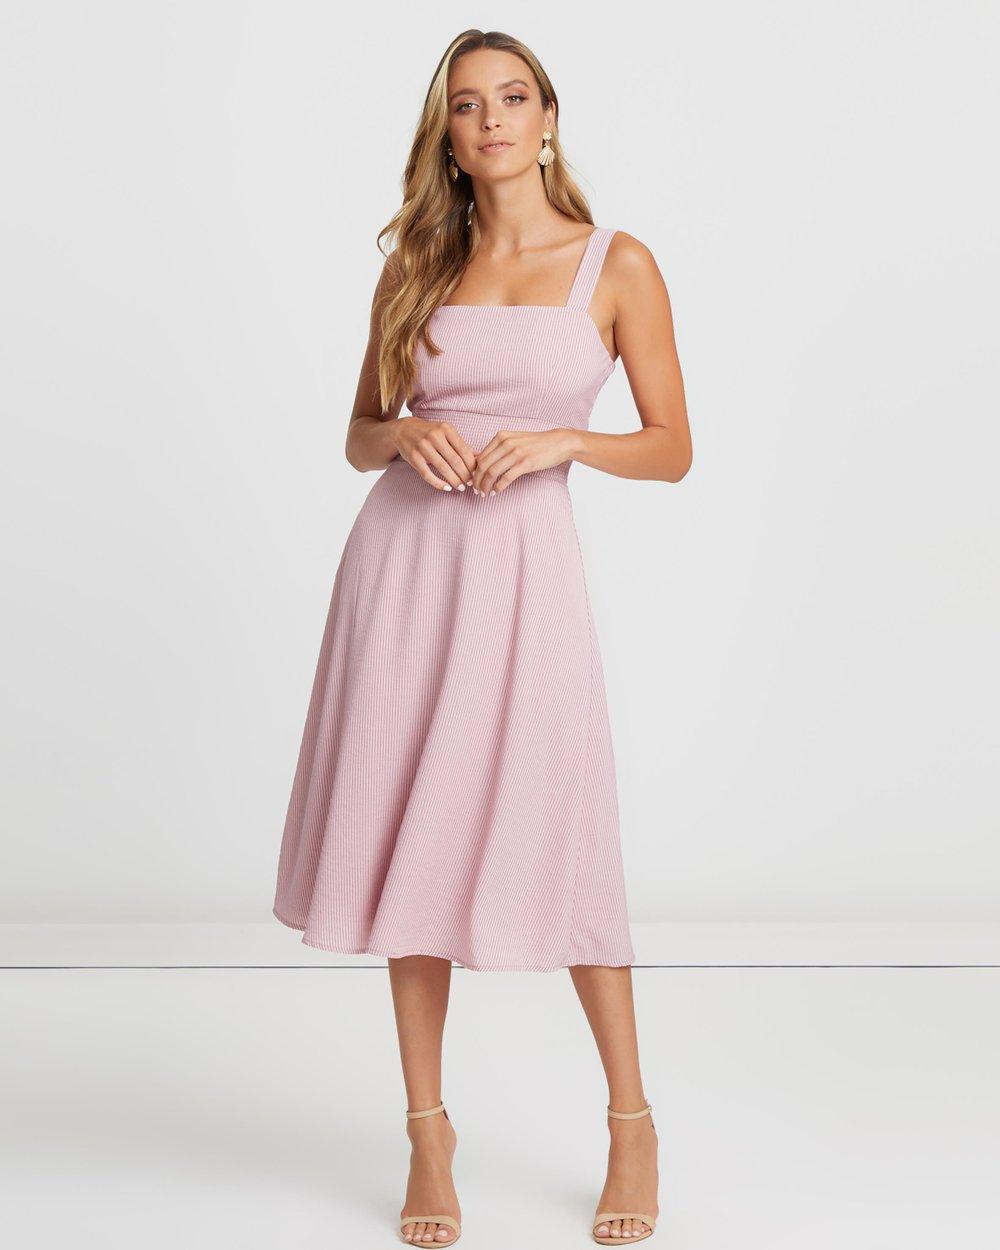 2a92a7dc161 Marlowe Dress by Calli Online